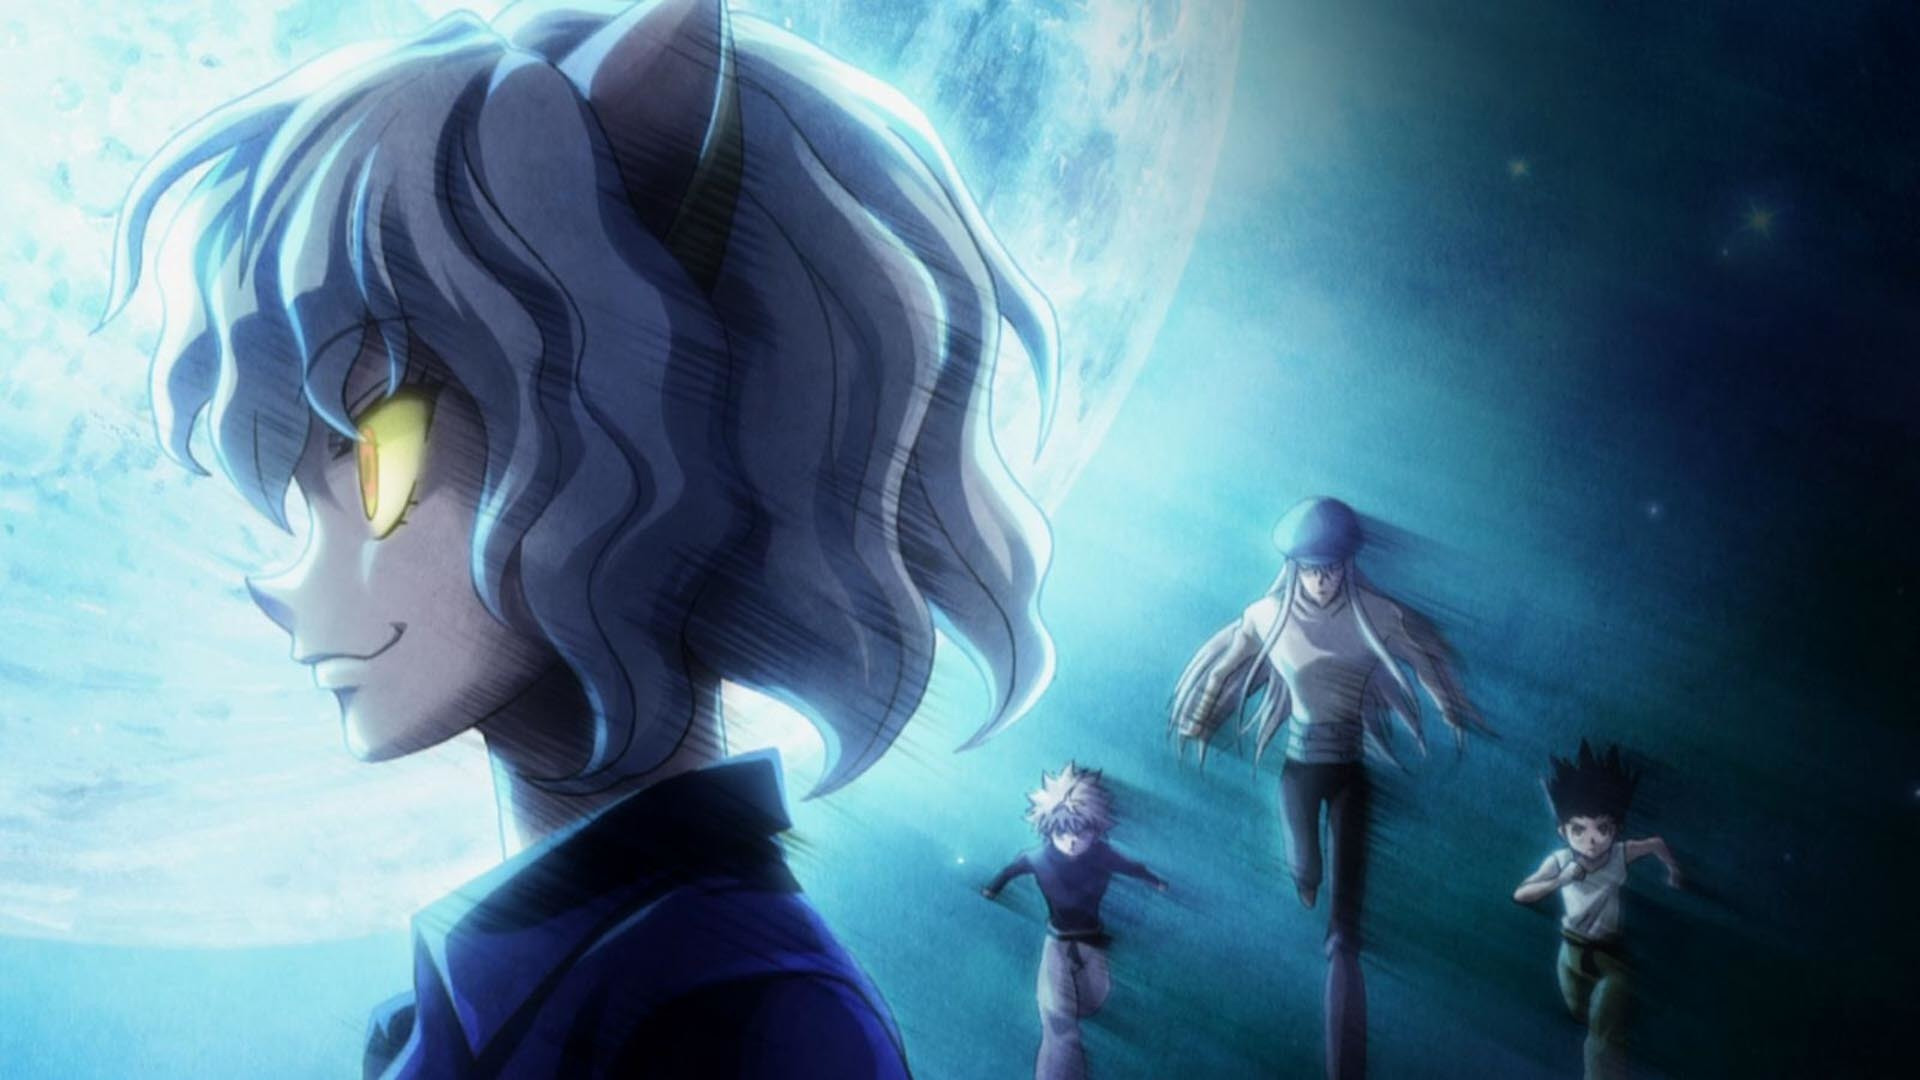 Anime Hunter X Hunter (2011)